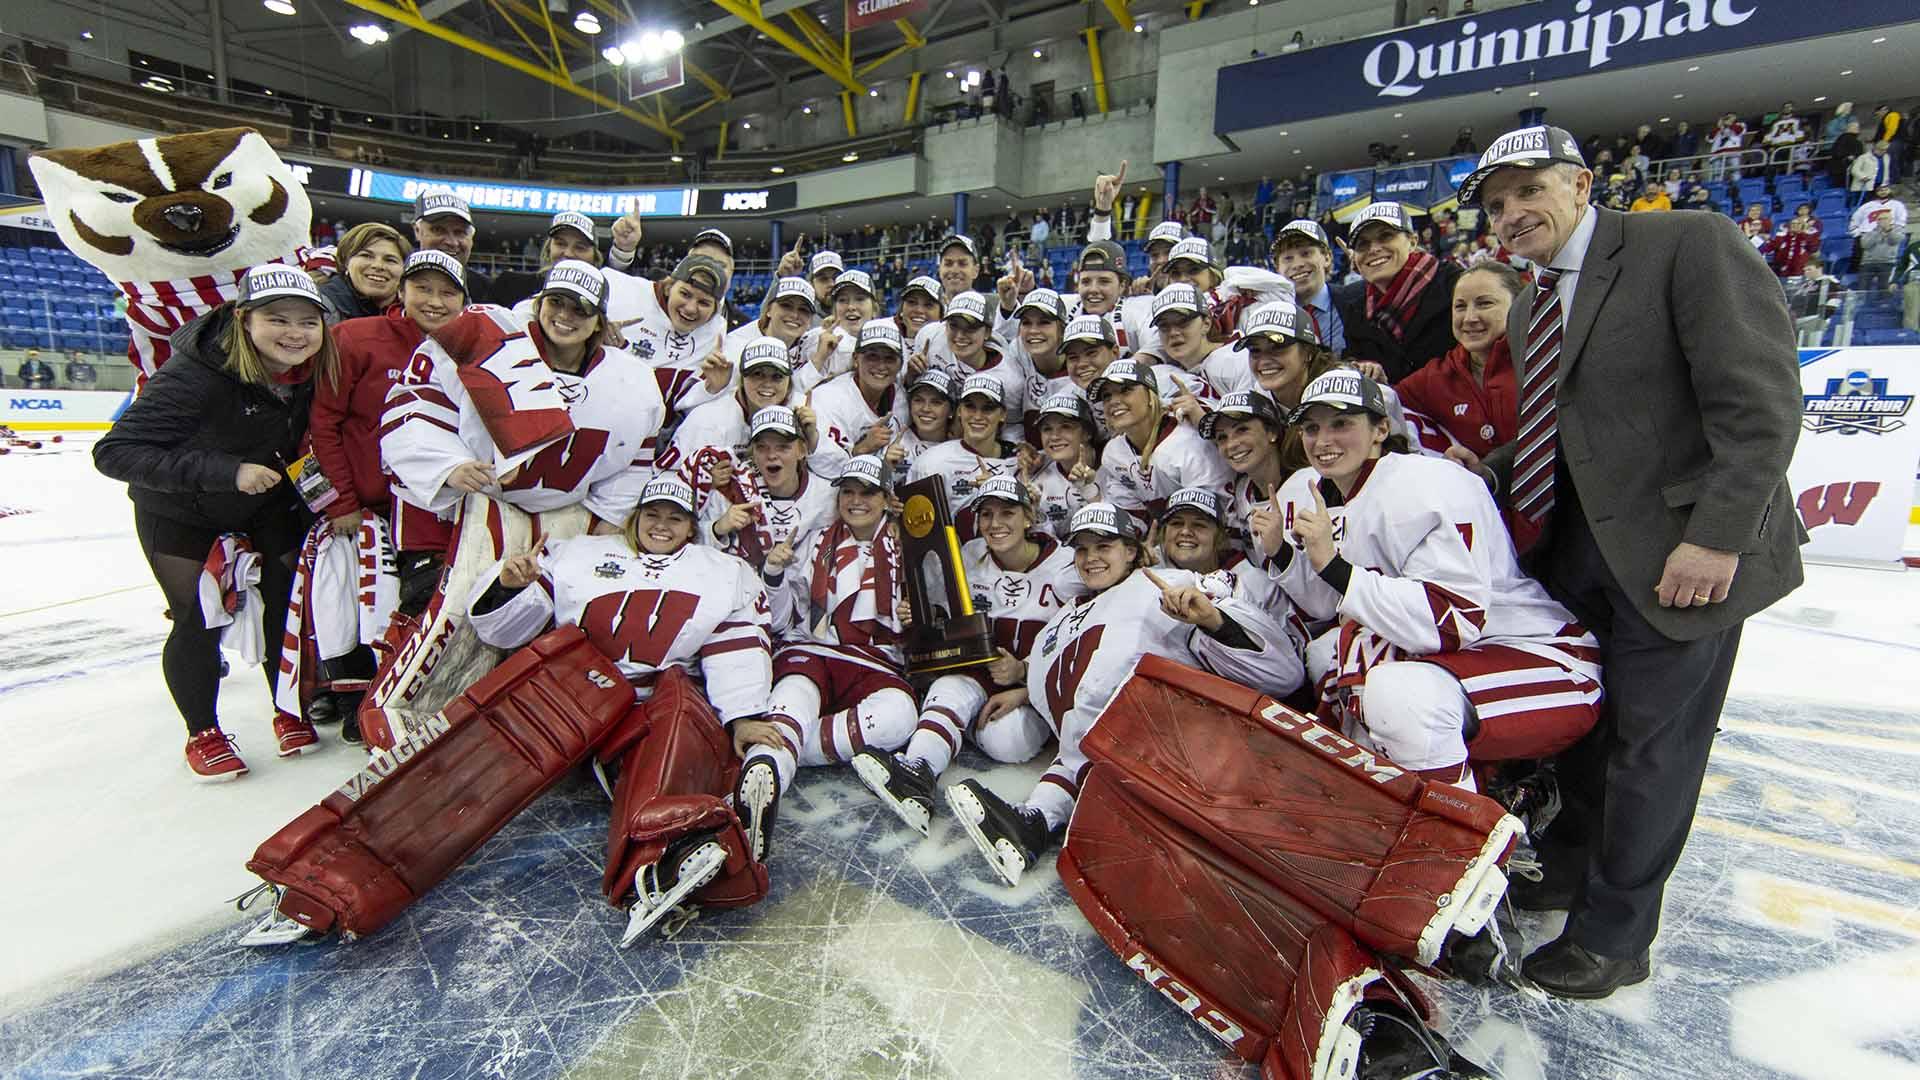 Wisconsin Badgers win their fifth NCAA women's hockey championship